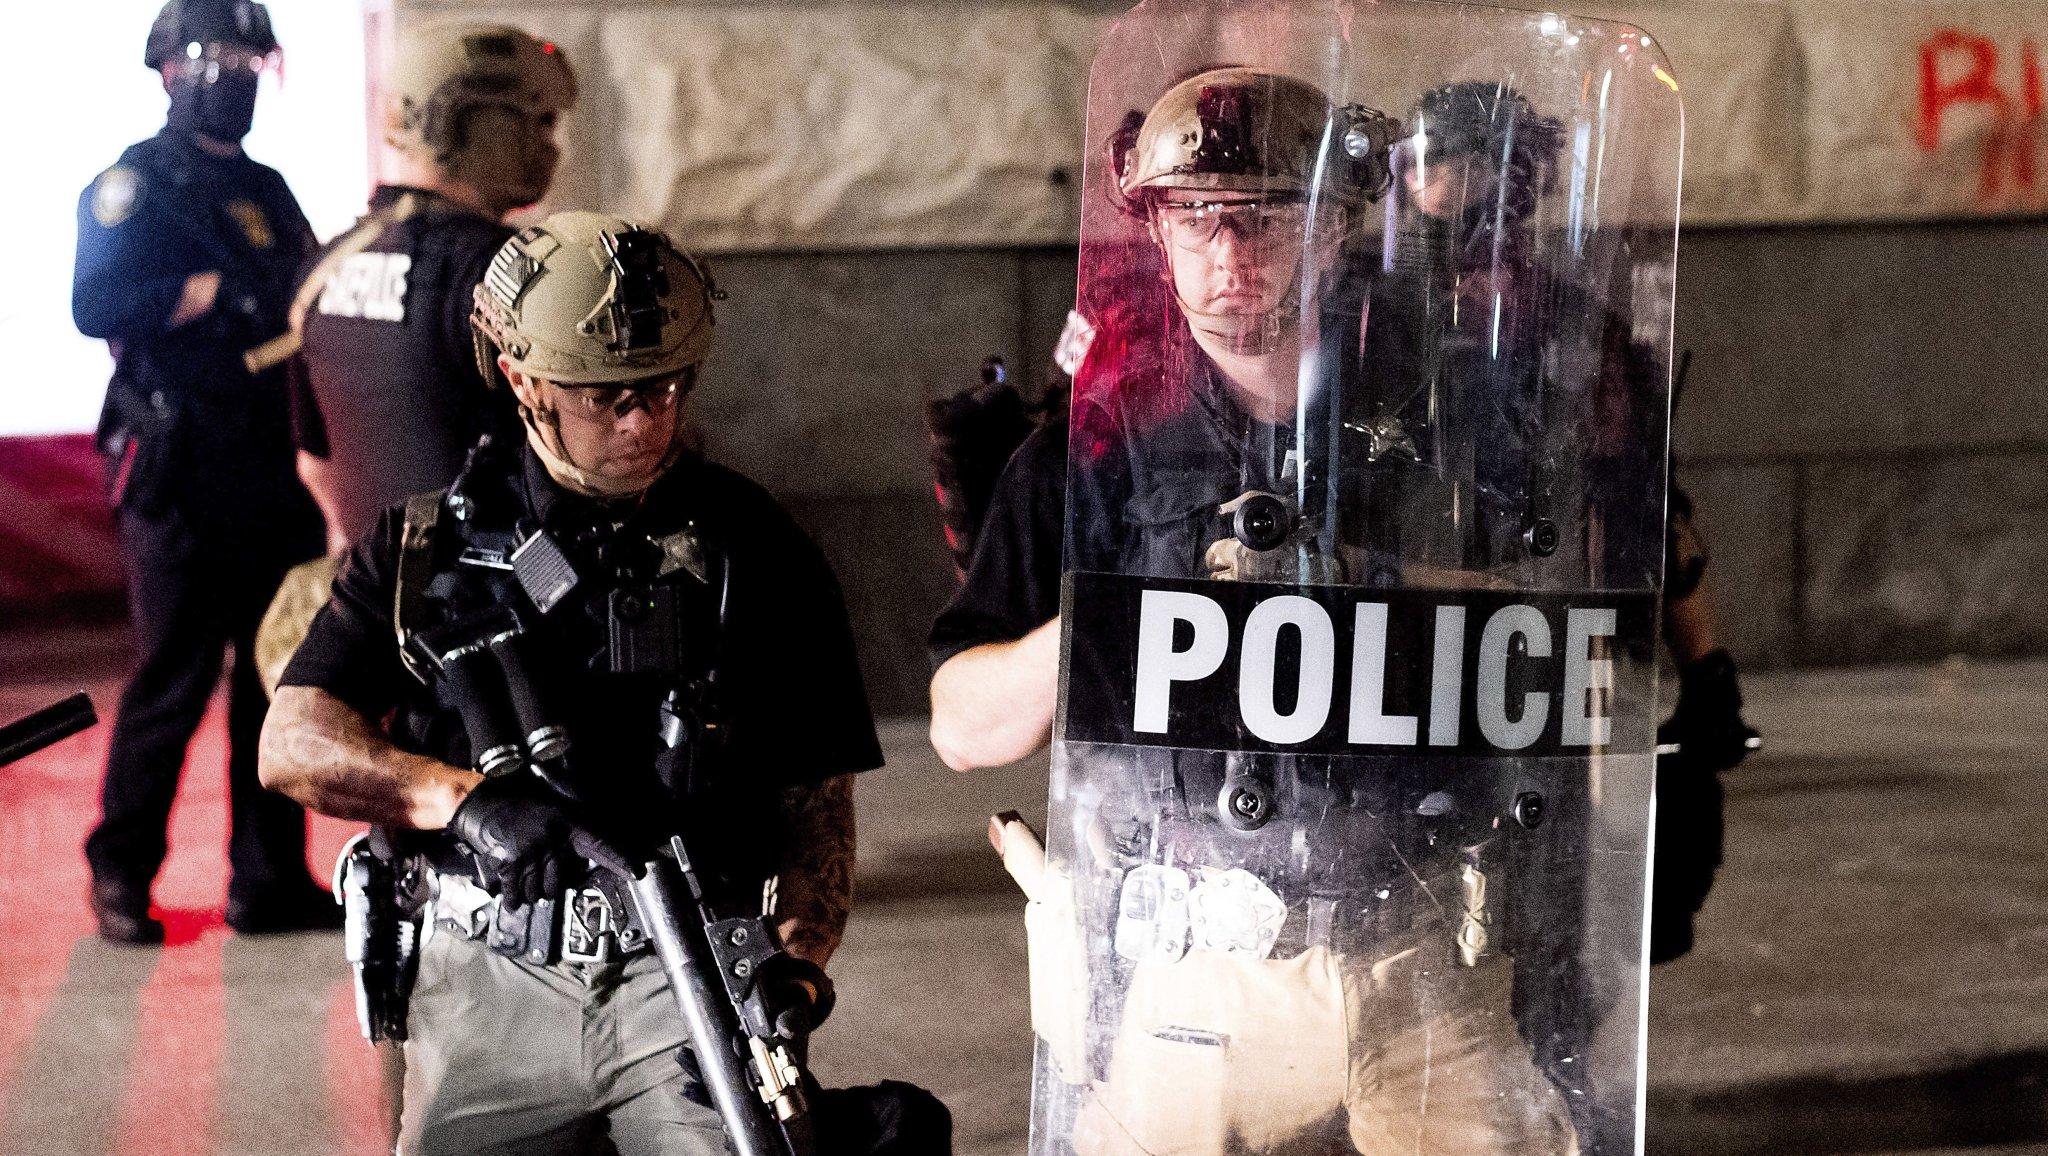 Rioters vandalize, set fire at Portland Police Association office: police